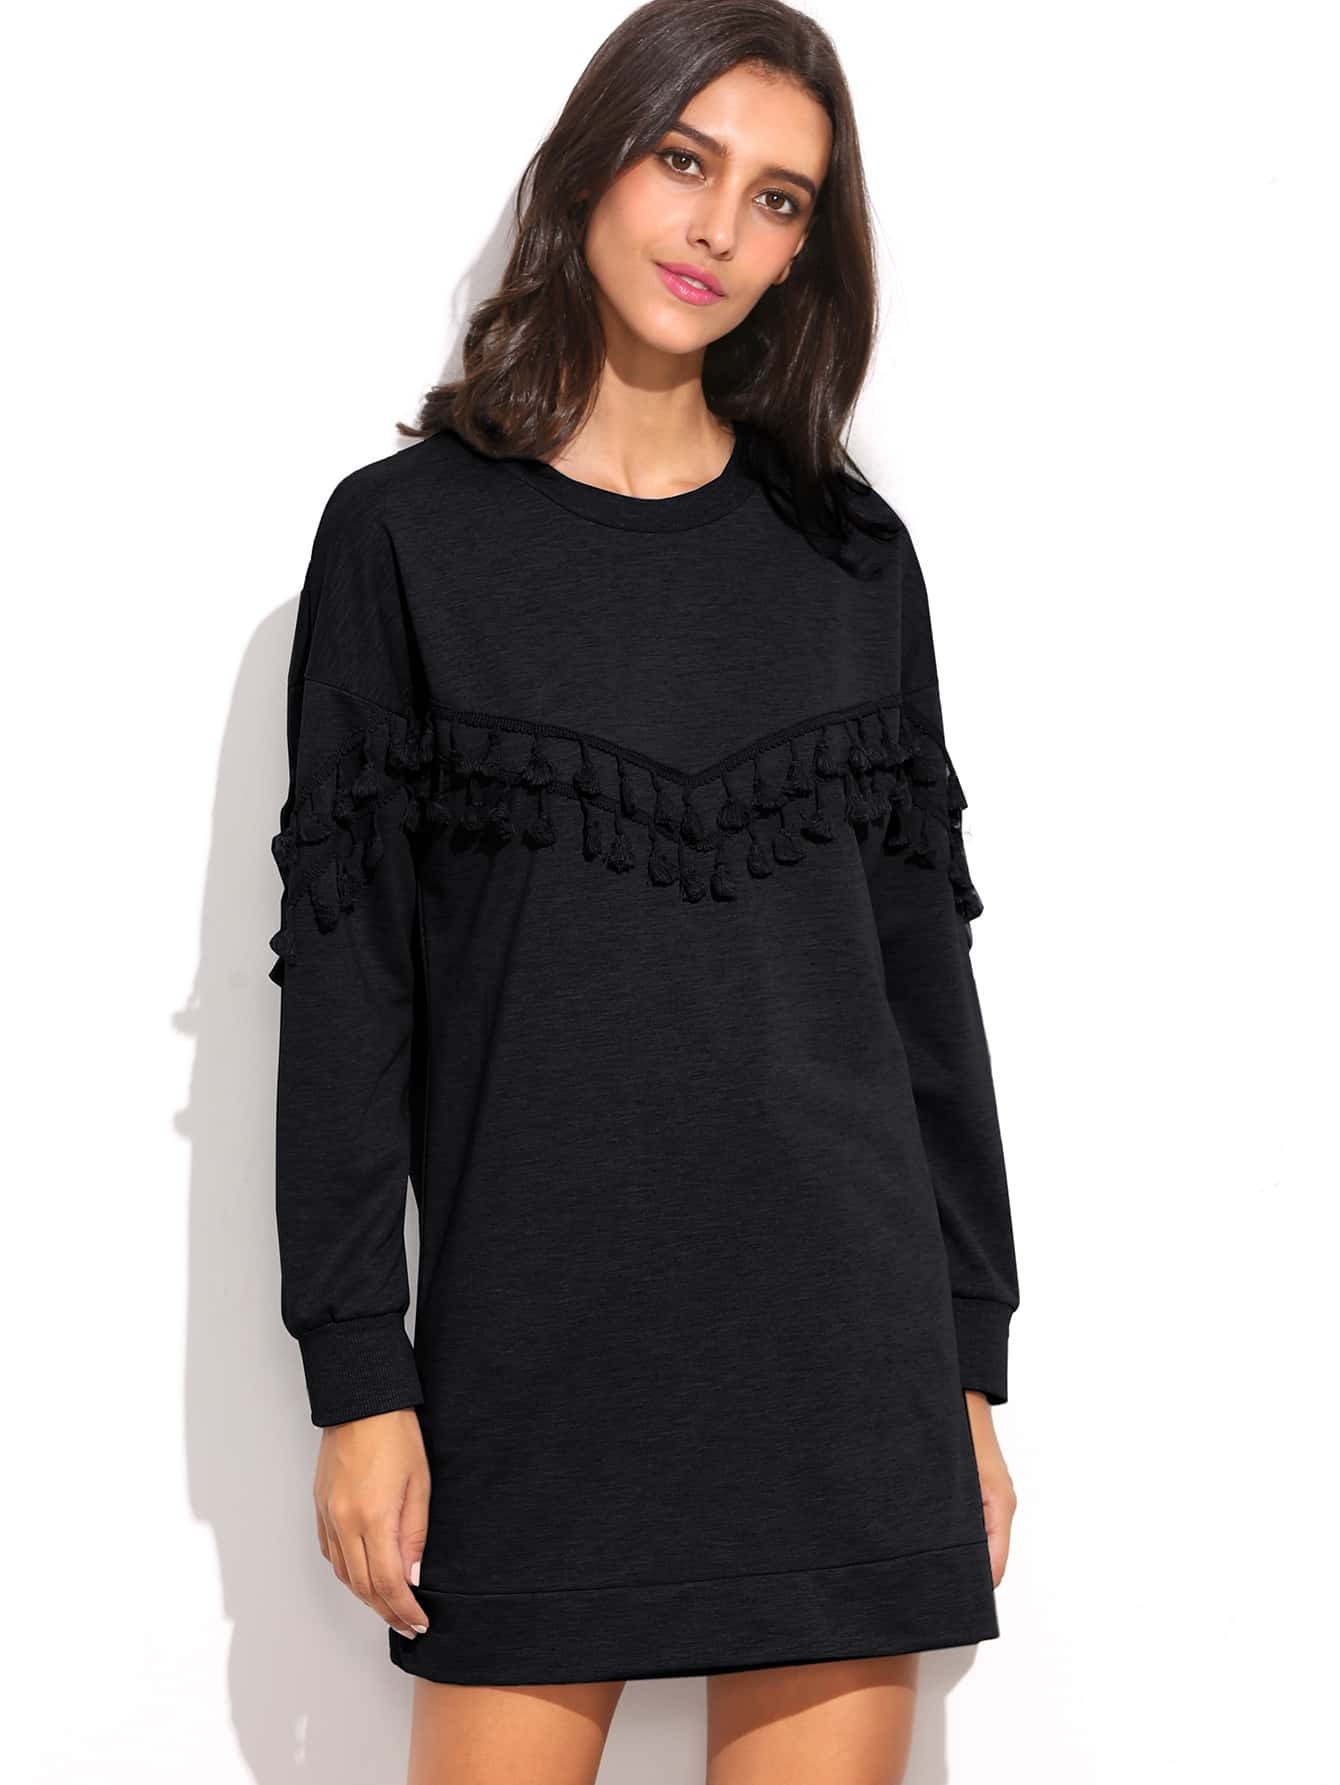 robe sweat shirt manche longue avec franges noir french romwe. Black Bedroom Furniture Sets. Home Design Ideas